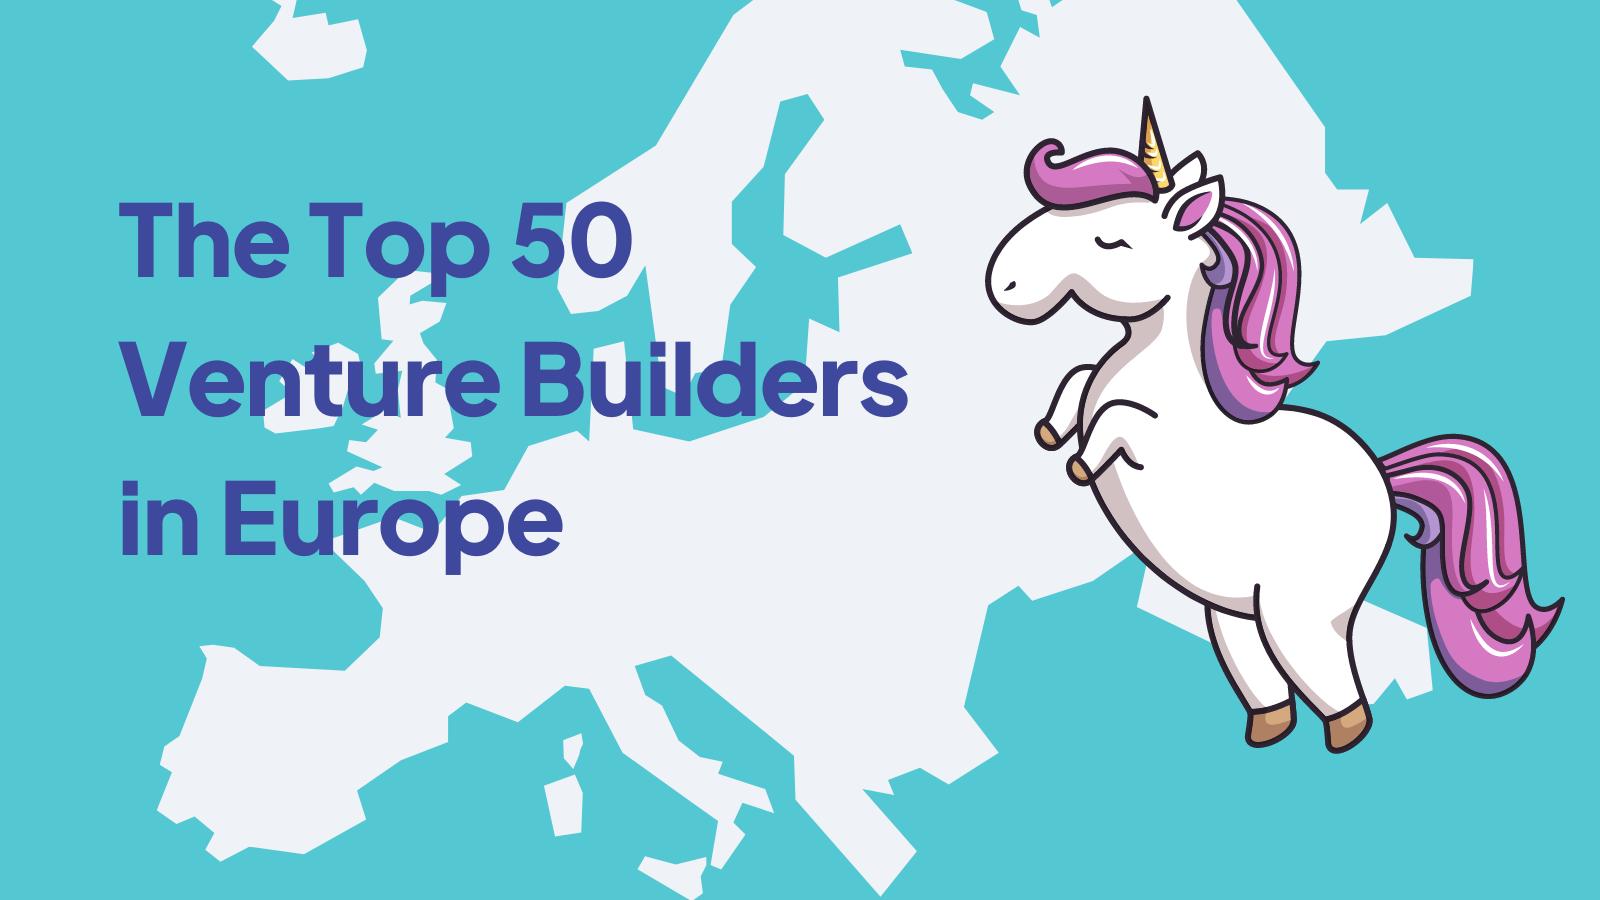 Top 50 Venture Builders in Europe 2021